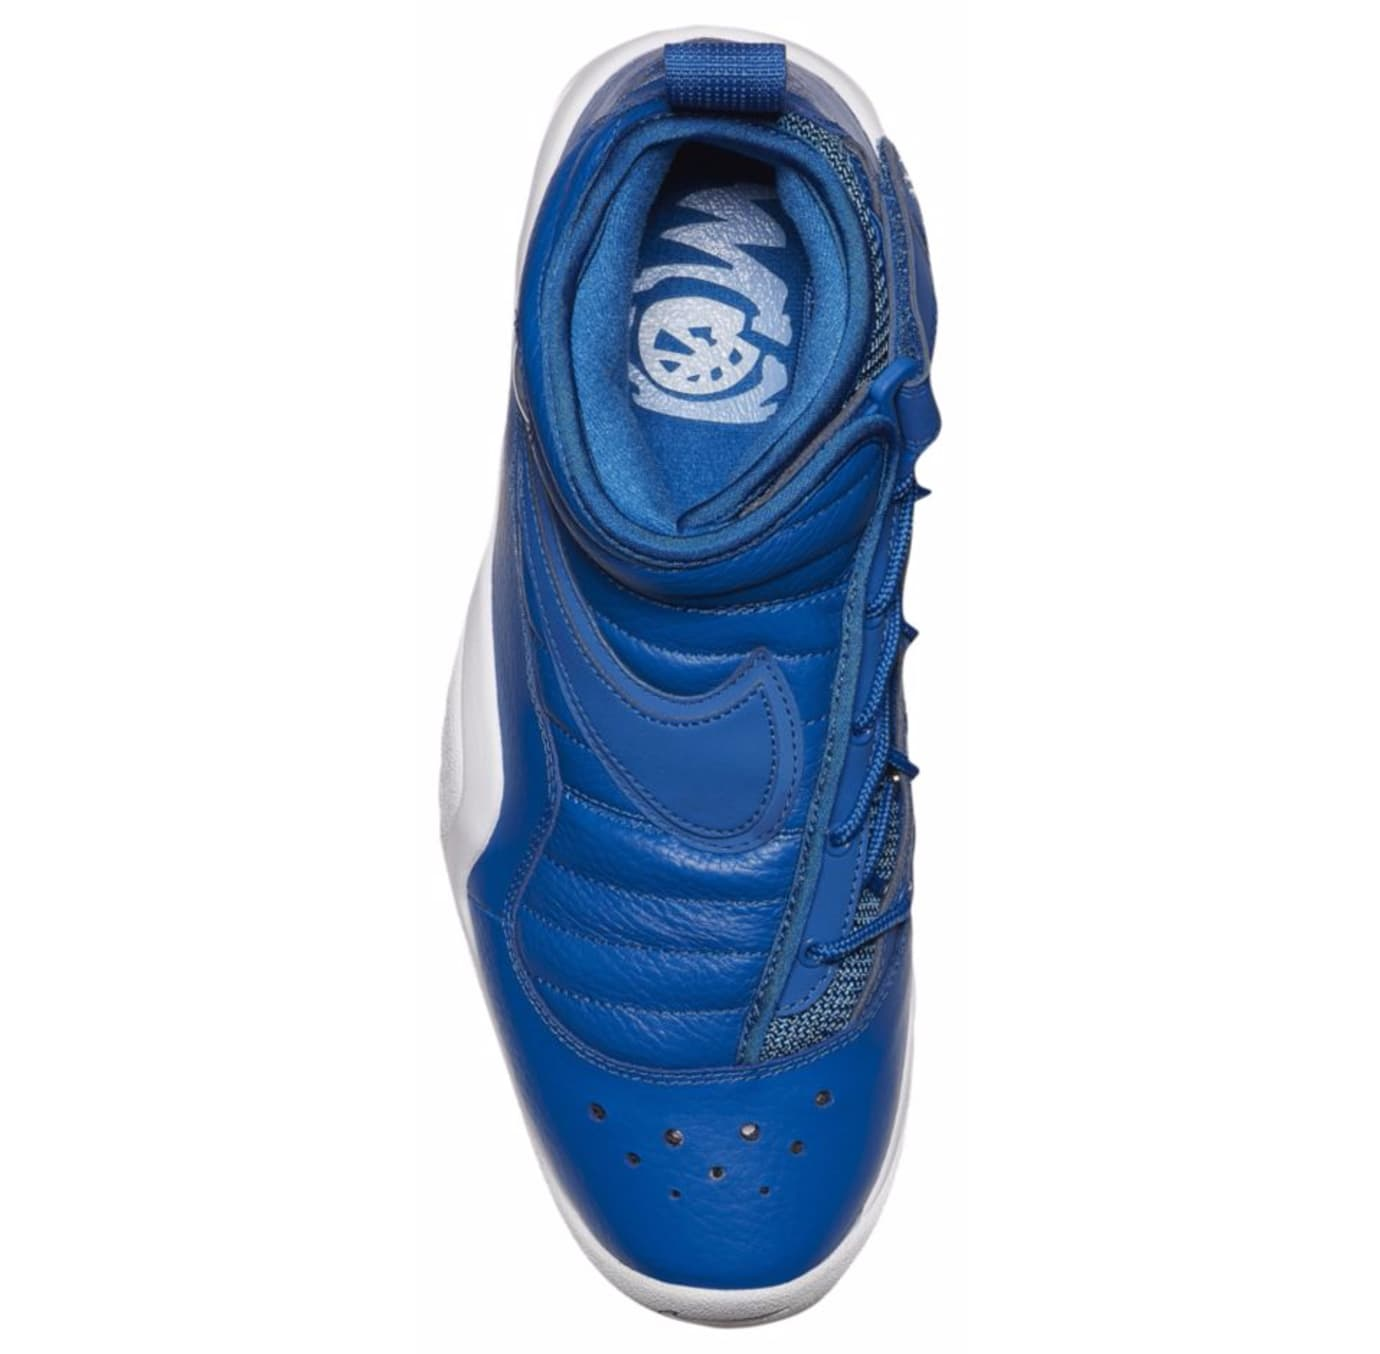 Image via Foot Locker Blue Jay Nike Air Shake Ndestrukt Top d054a9a75